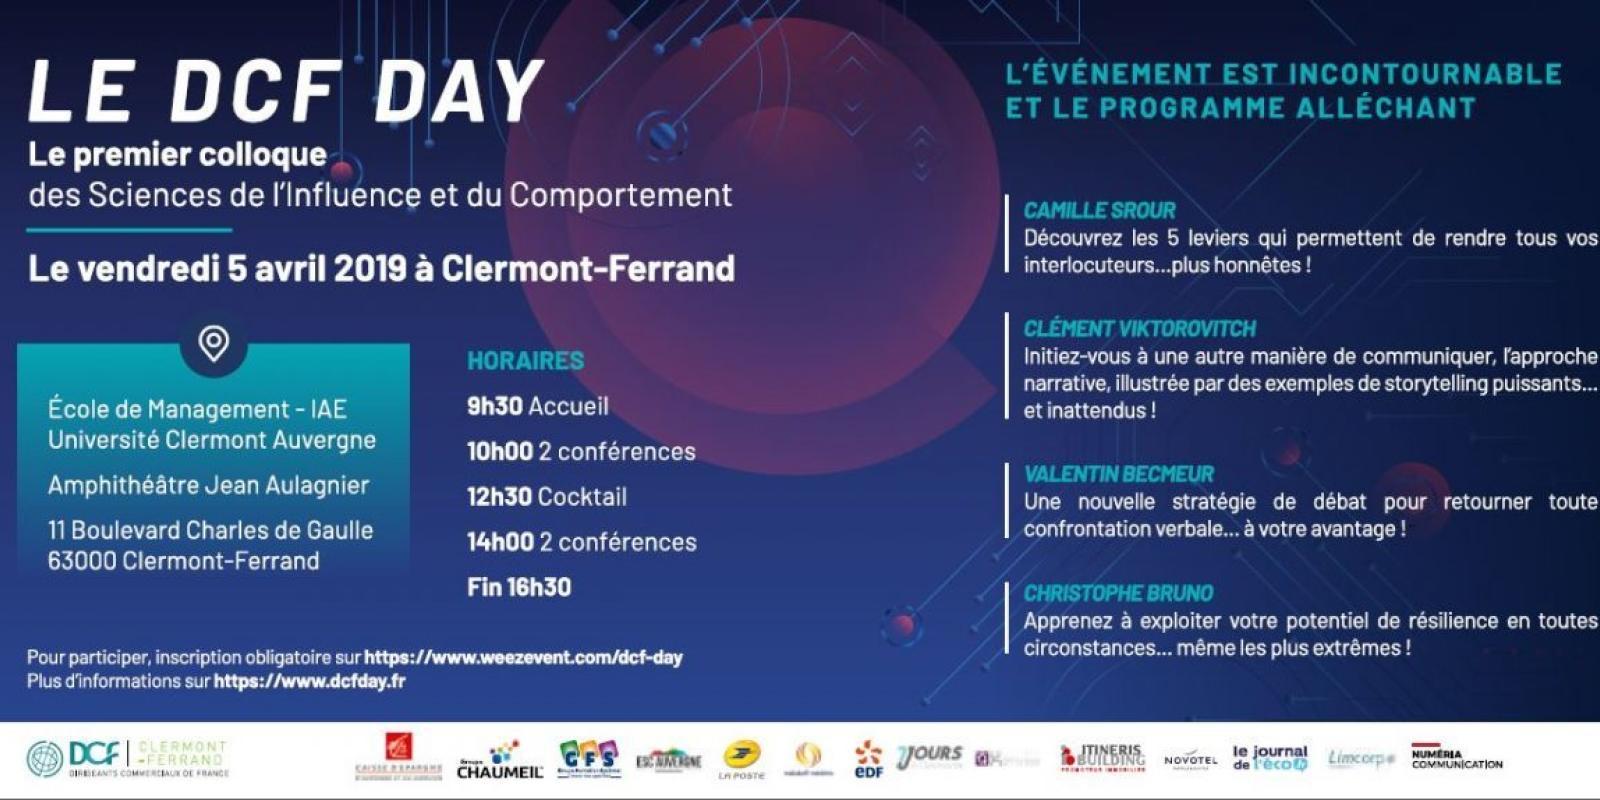 DCF DAY LE VENDREDI 5 AVRIL à CLERMONT-FERRAND